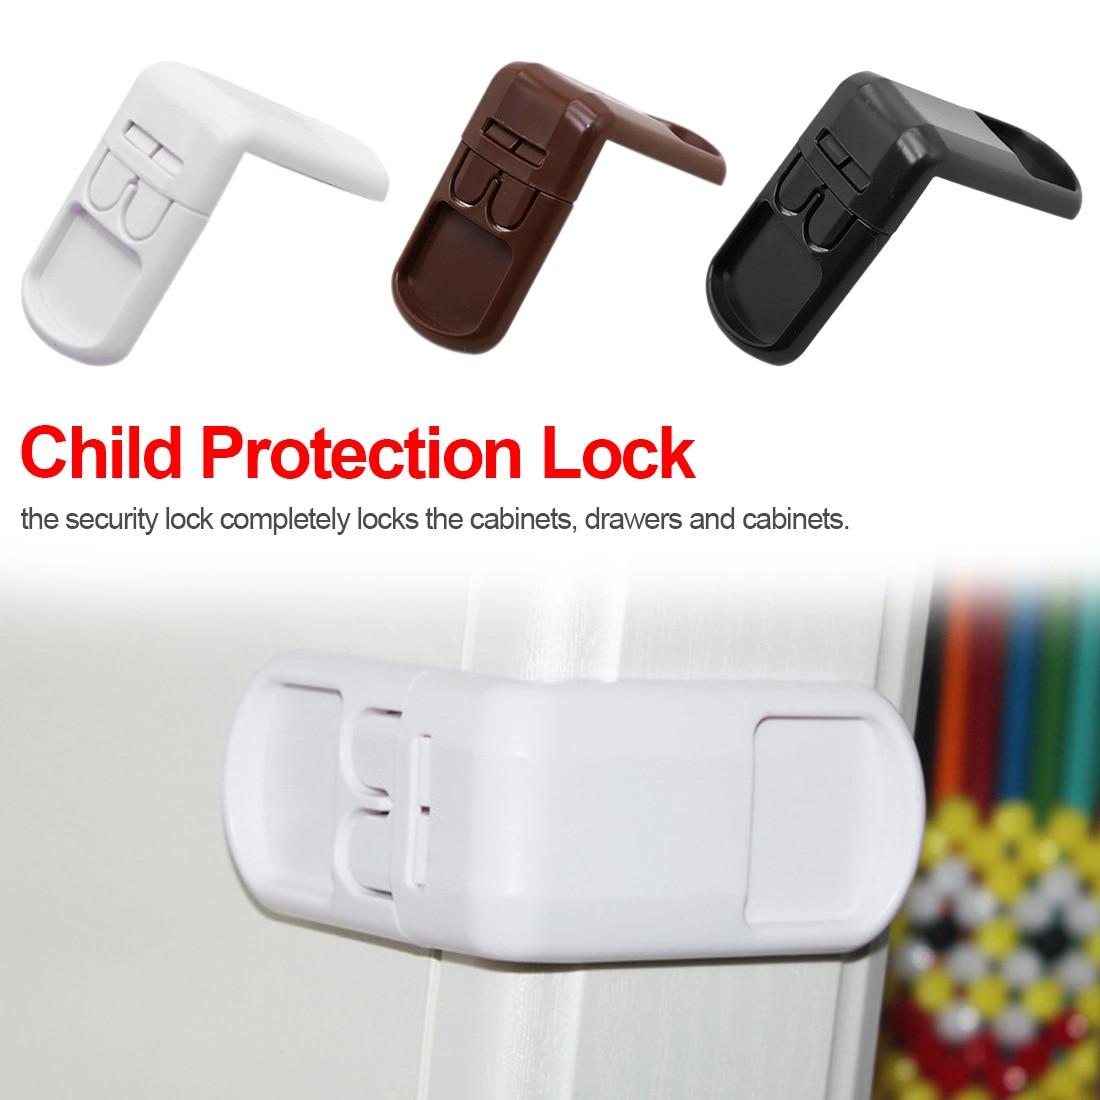 Child Lock Protection Of Children Locking Doors For Children's Safety Kids Safety Plastic Lock For Child Infant Baby Locks